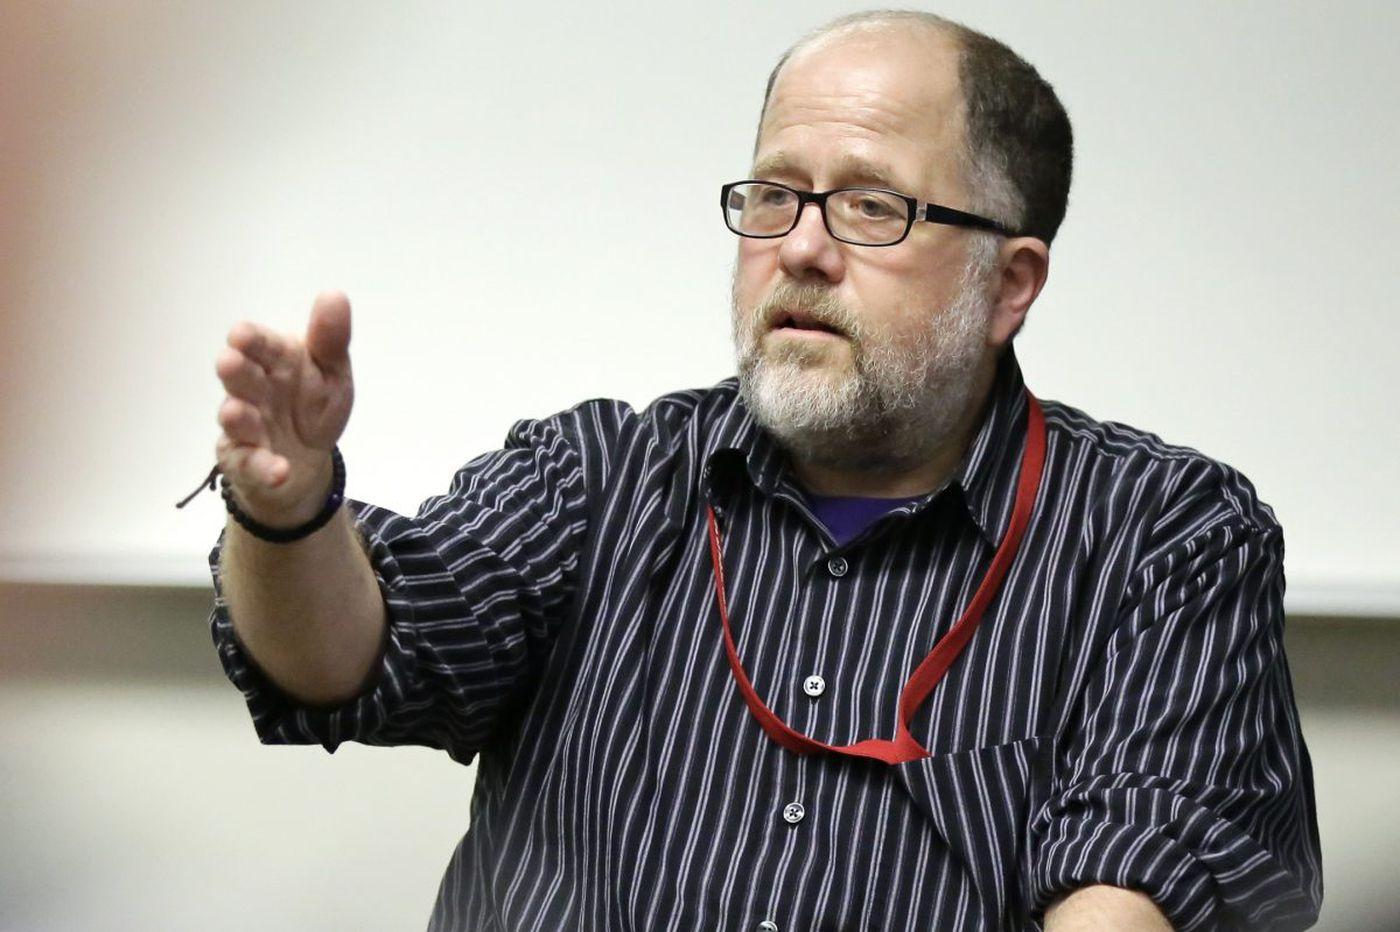 Temple professor Jeff Draine has Alzheimer's - and he's still teaching